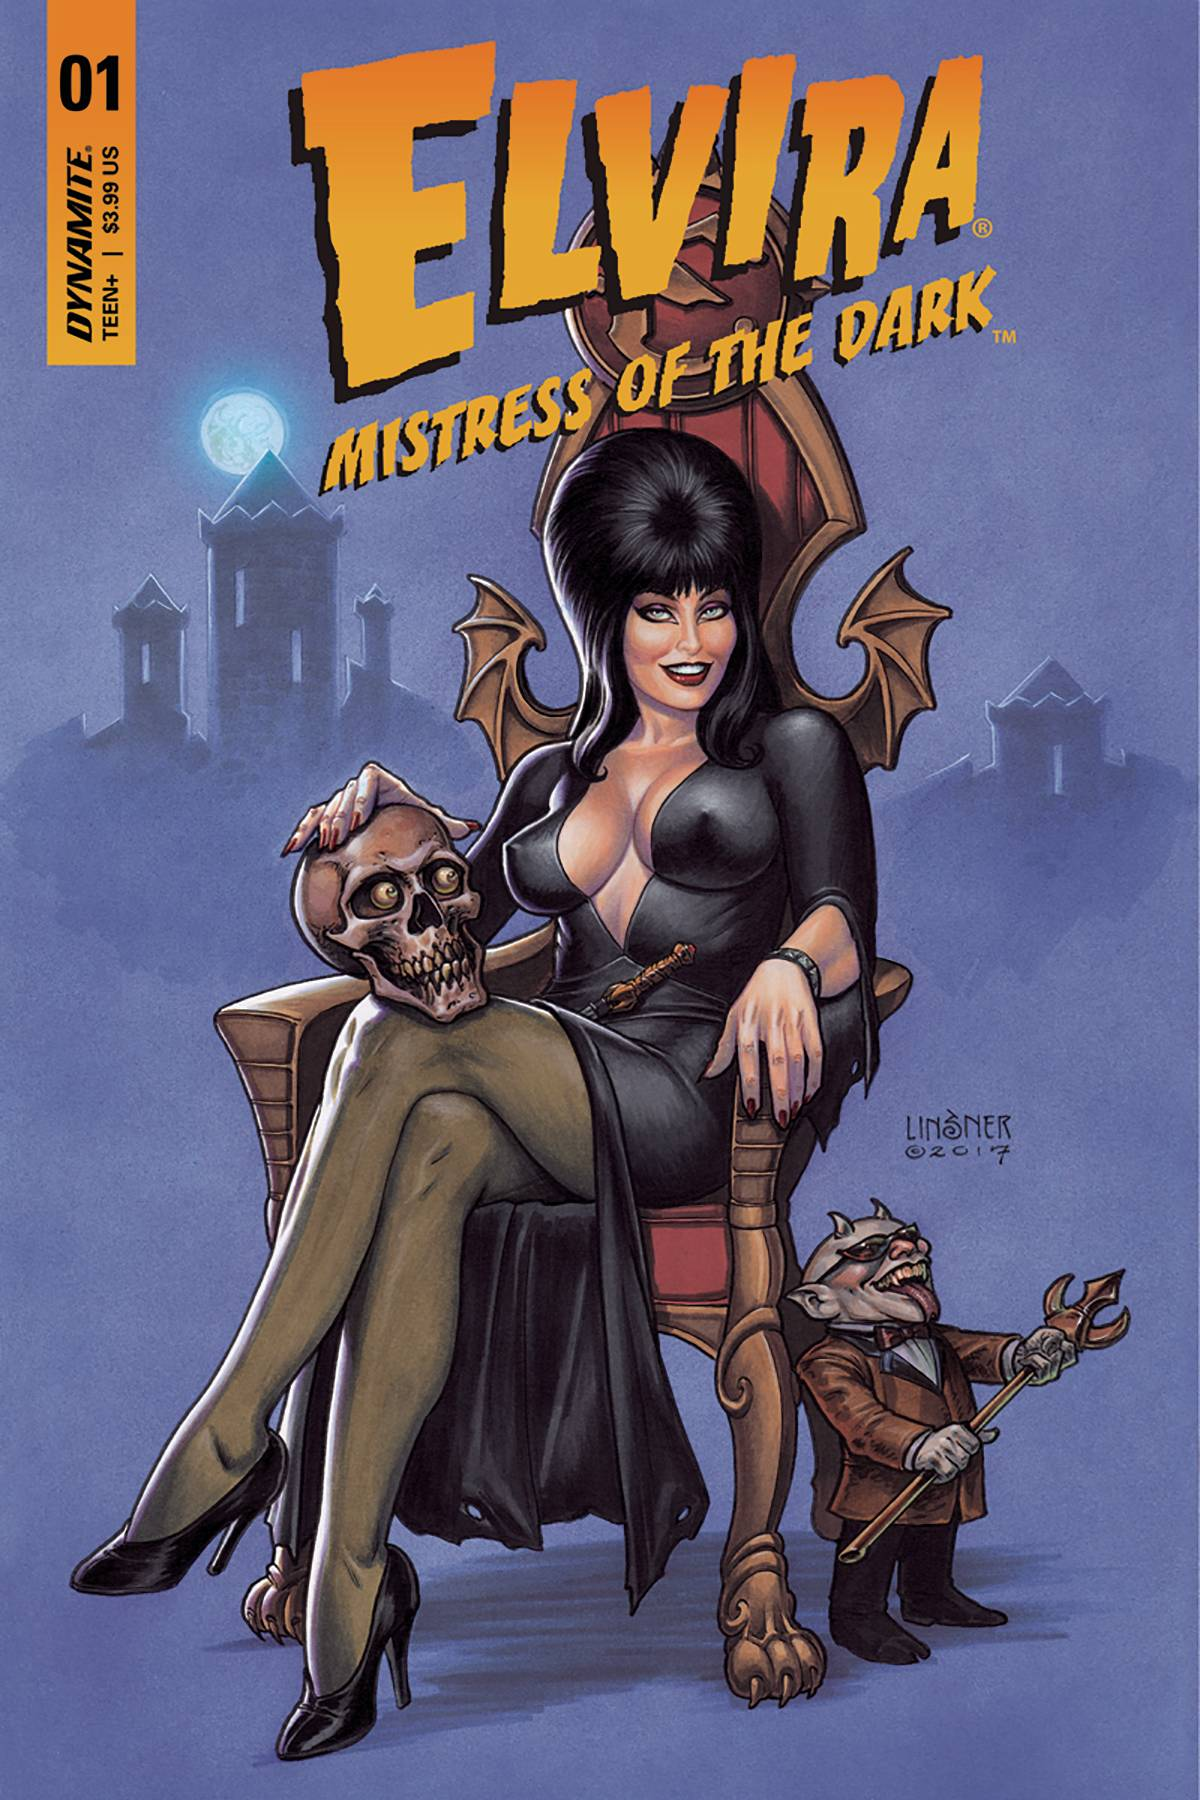 ELVIRA MISTRESS OF DARK #1